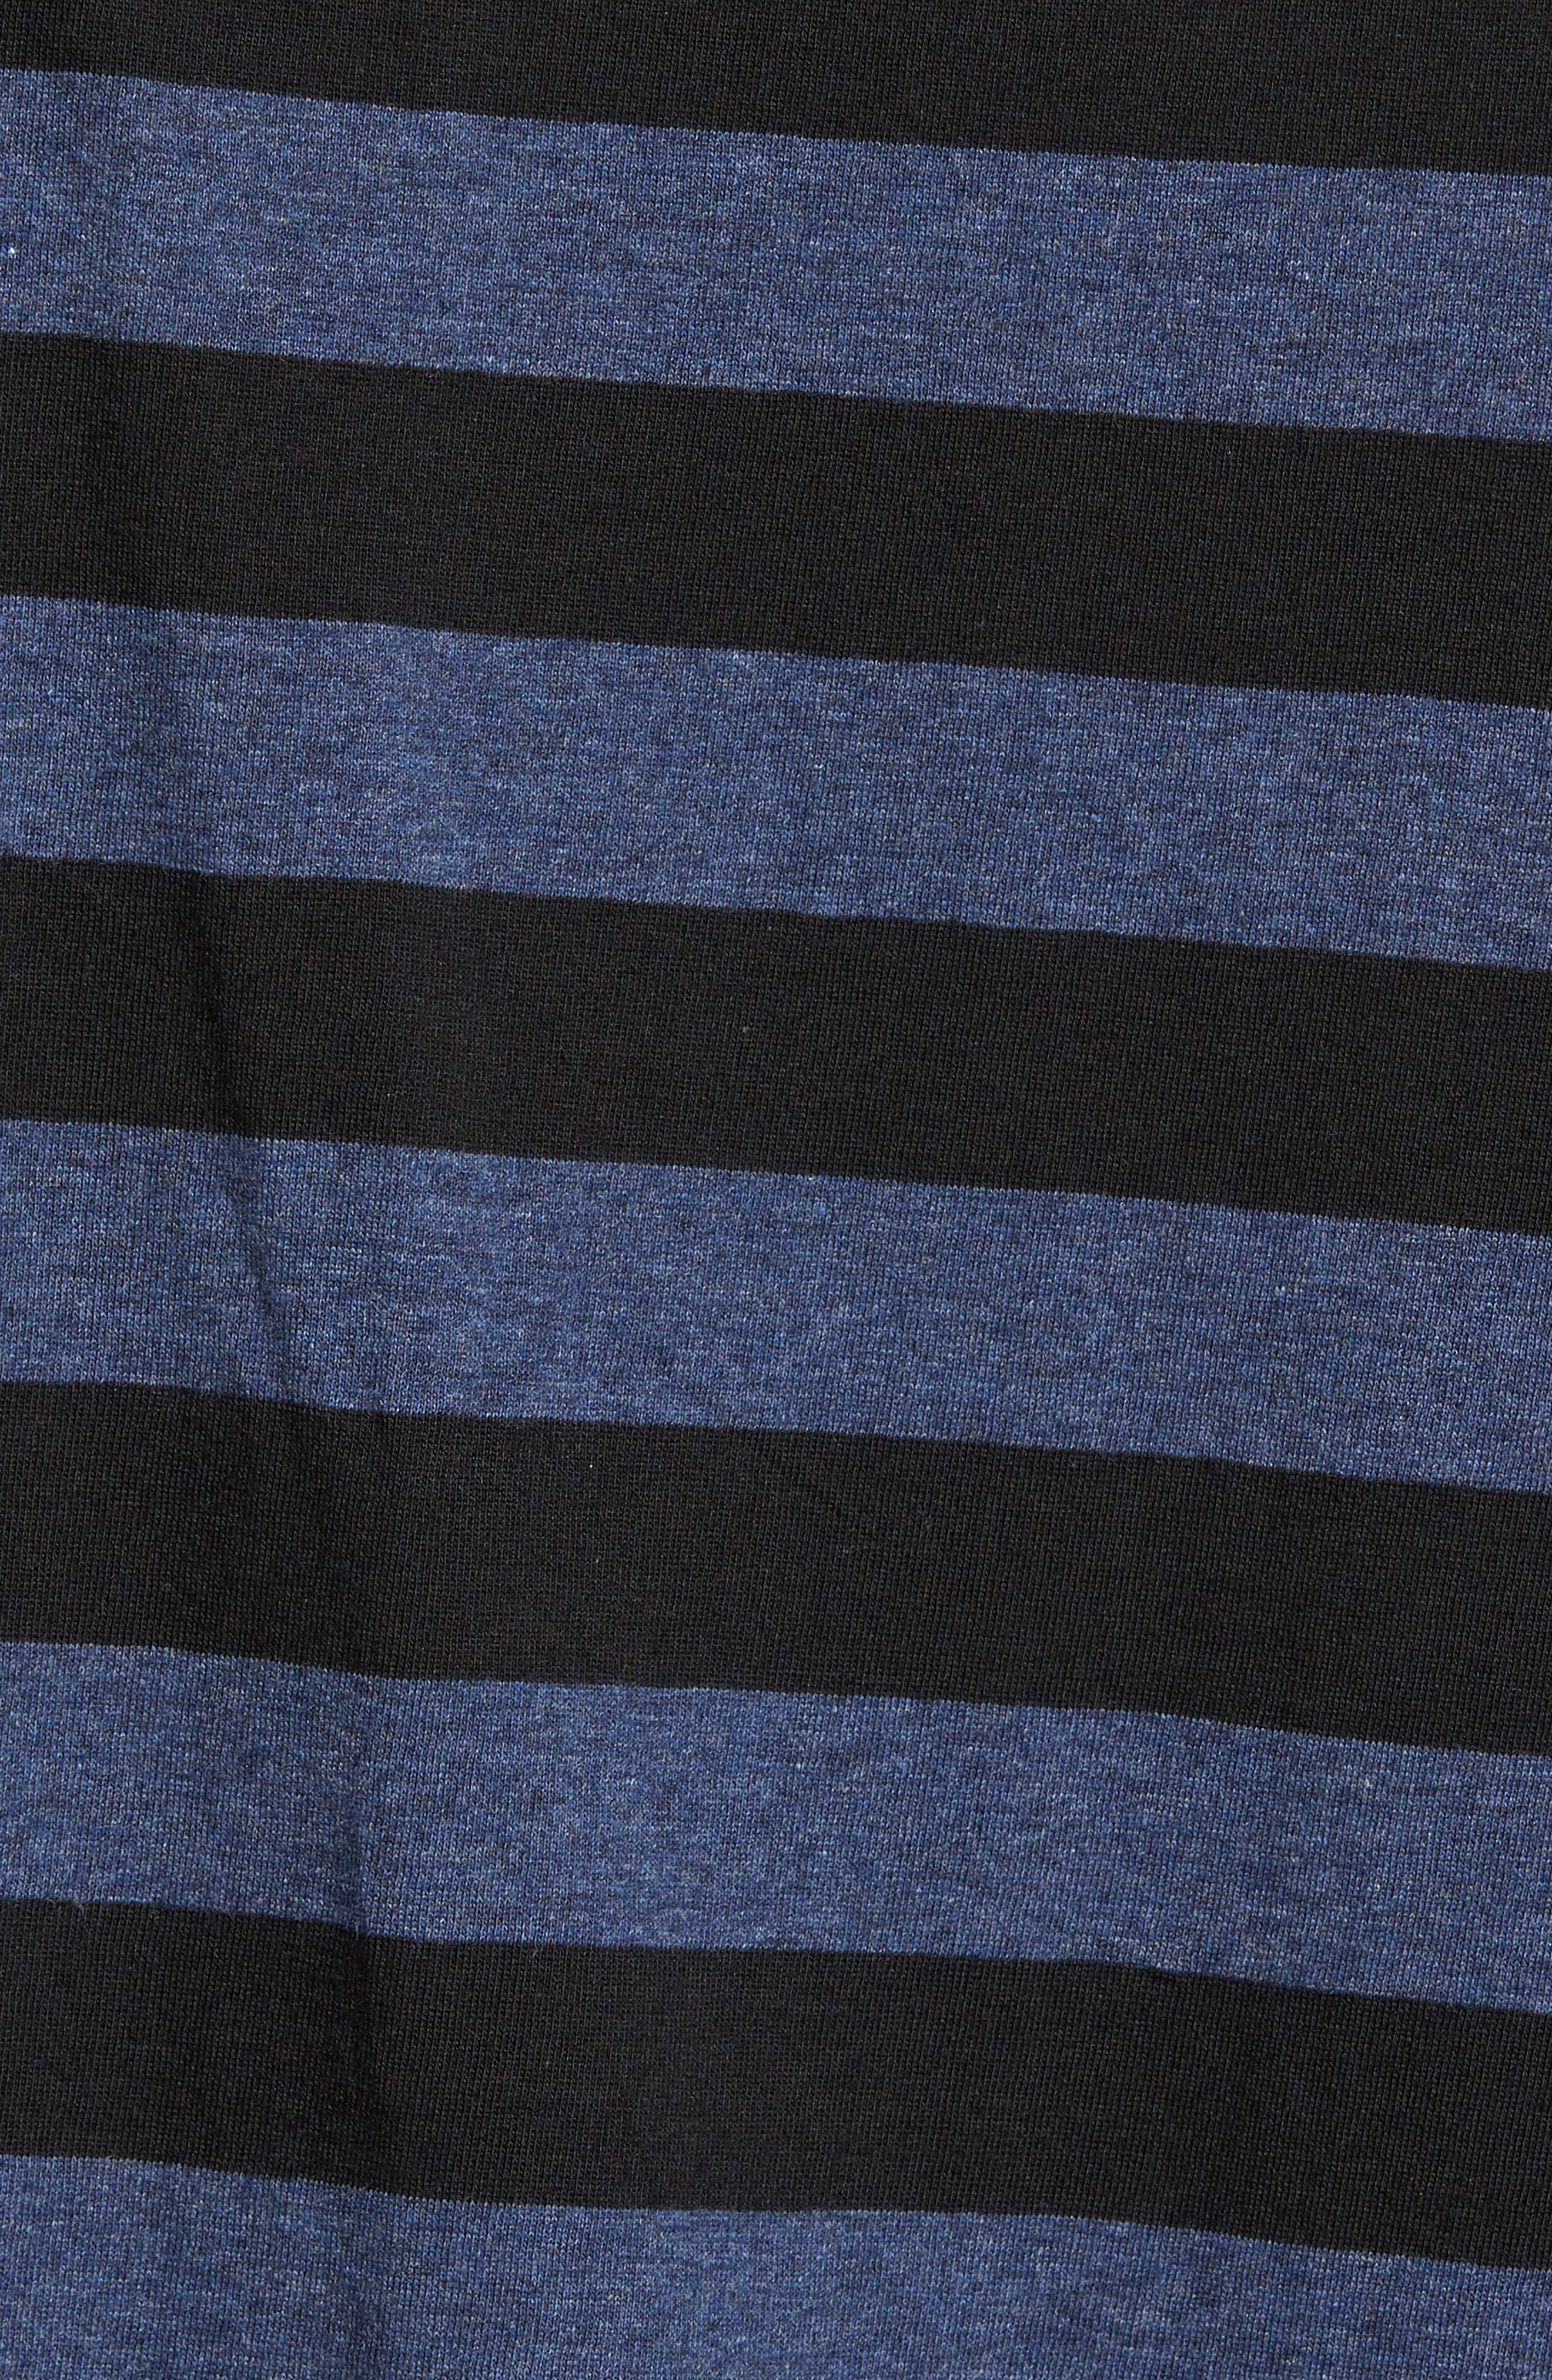 Striped Long Sleeve Henley T-Shirt,                             Alternate thumbnail 5, color,                             469